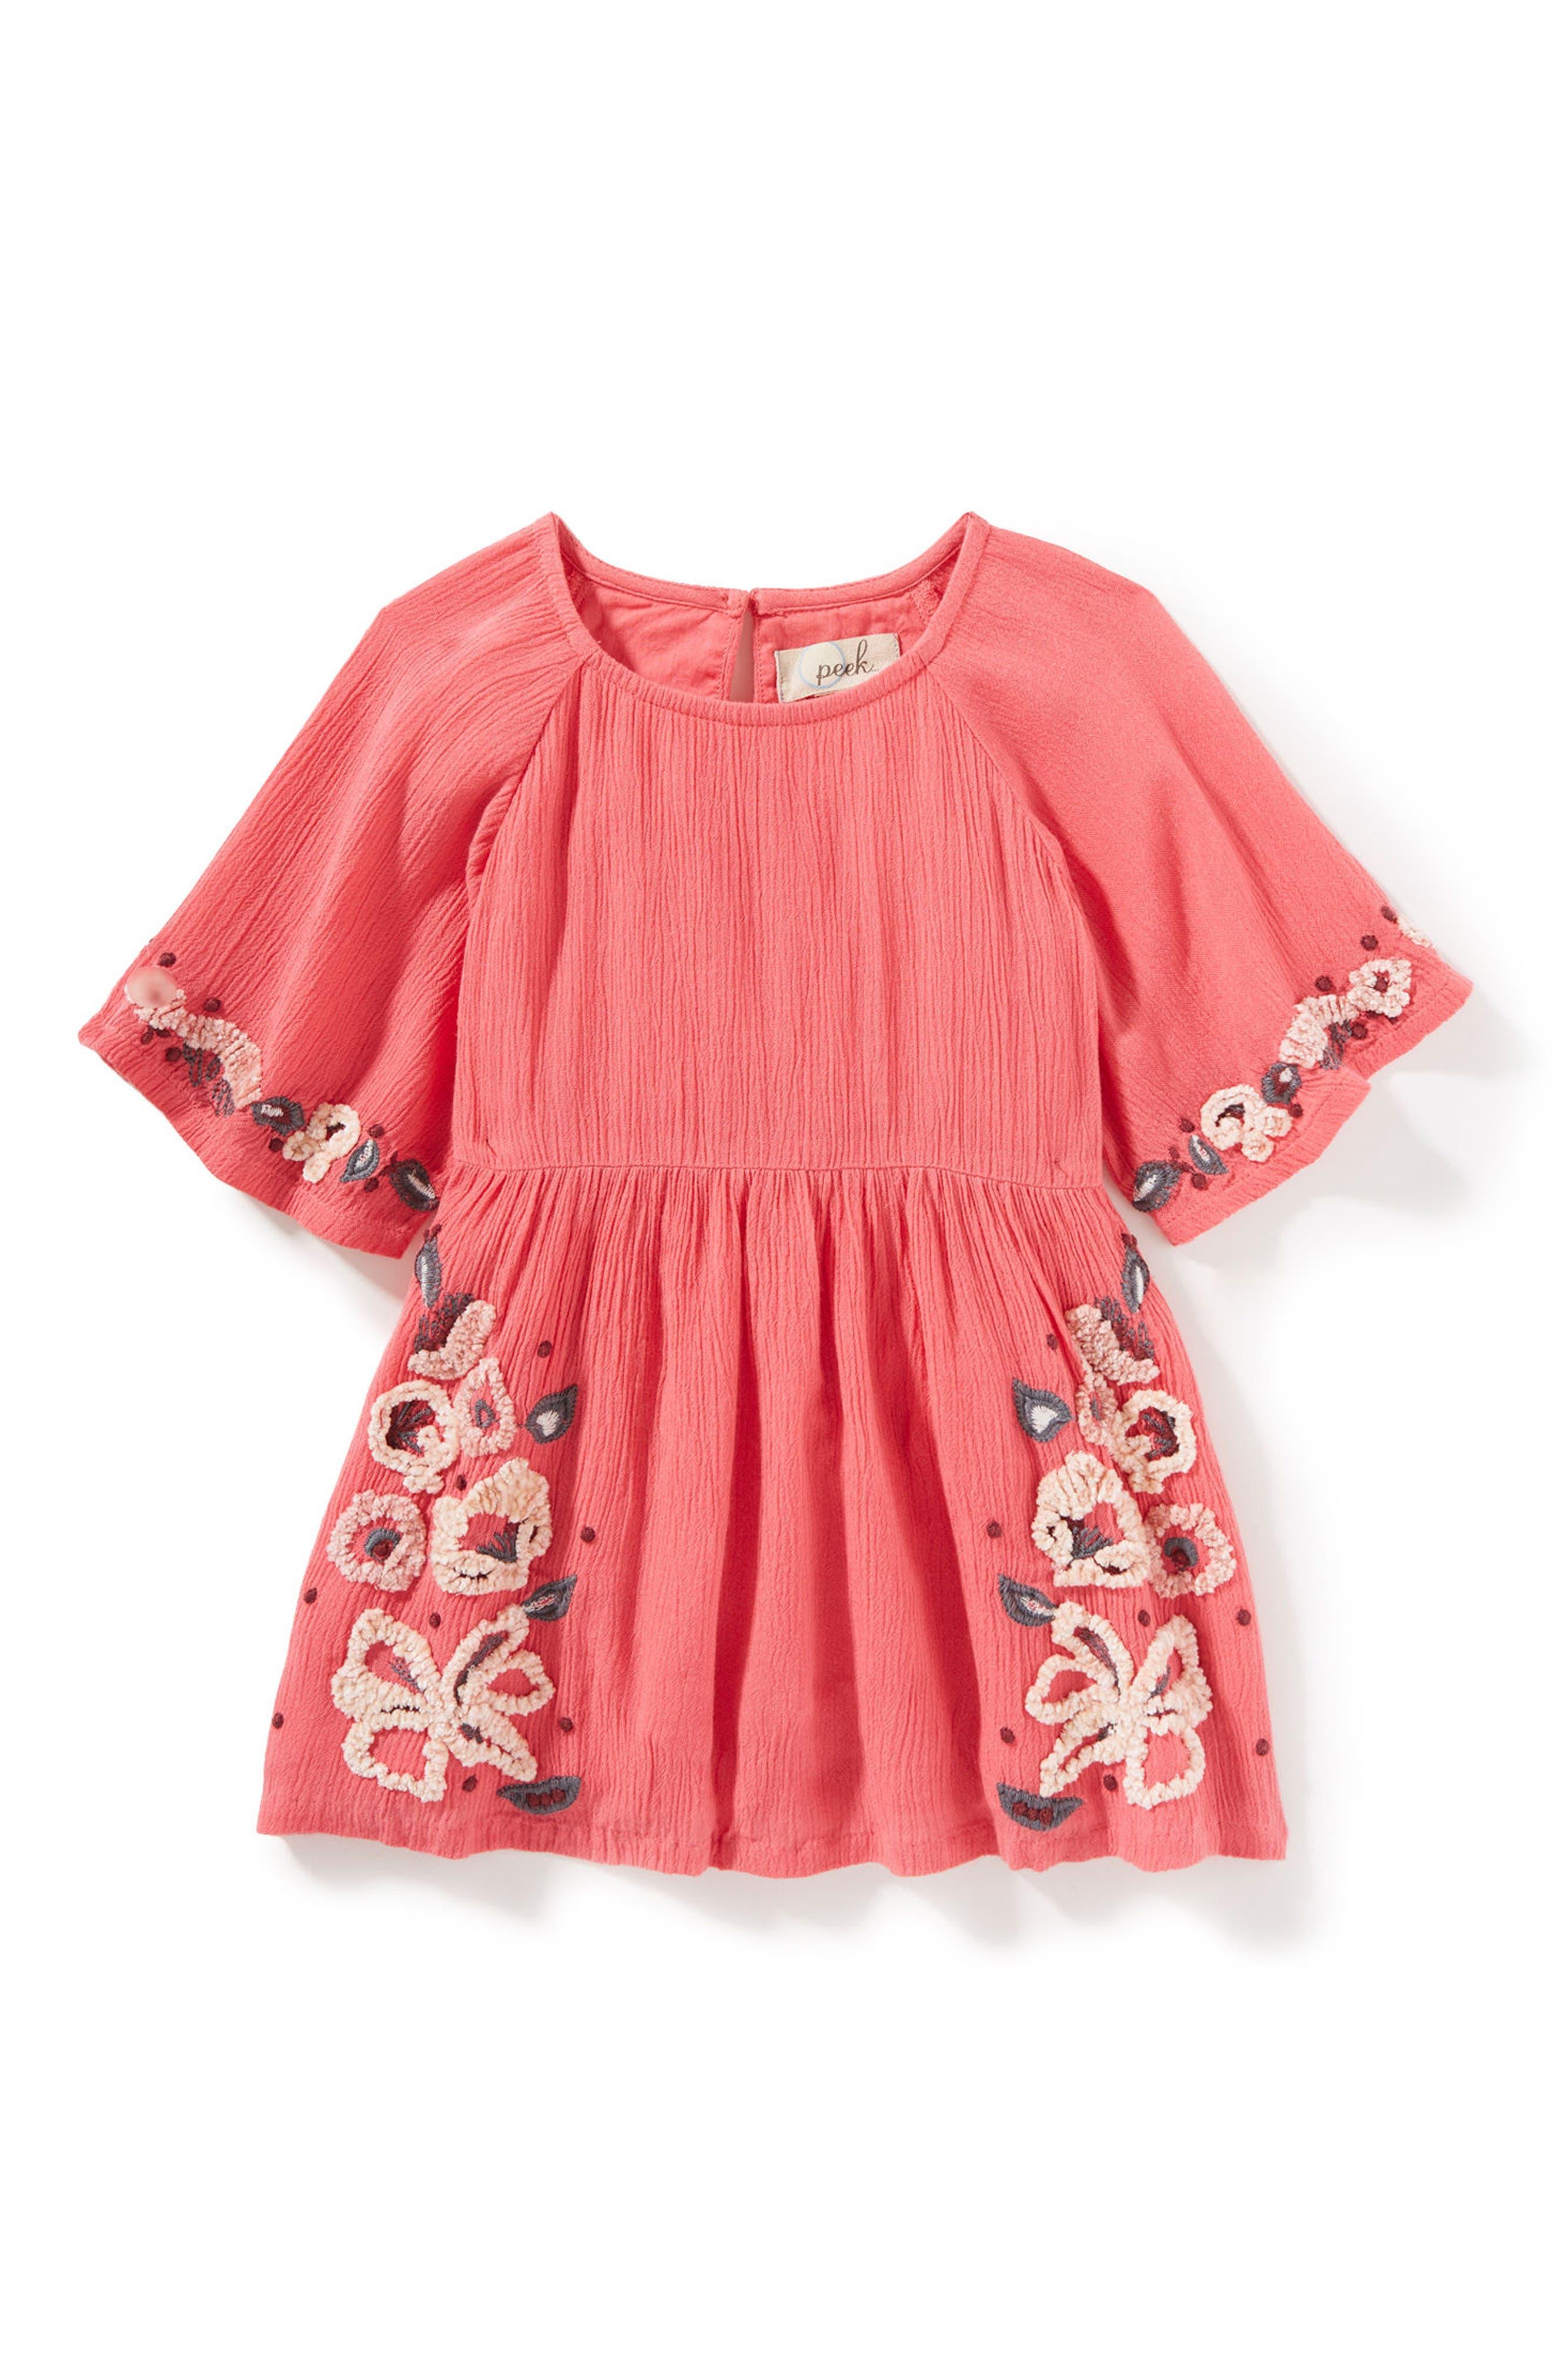 Peek Eva Gauze Dress (Baby Girls)